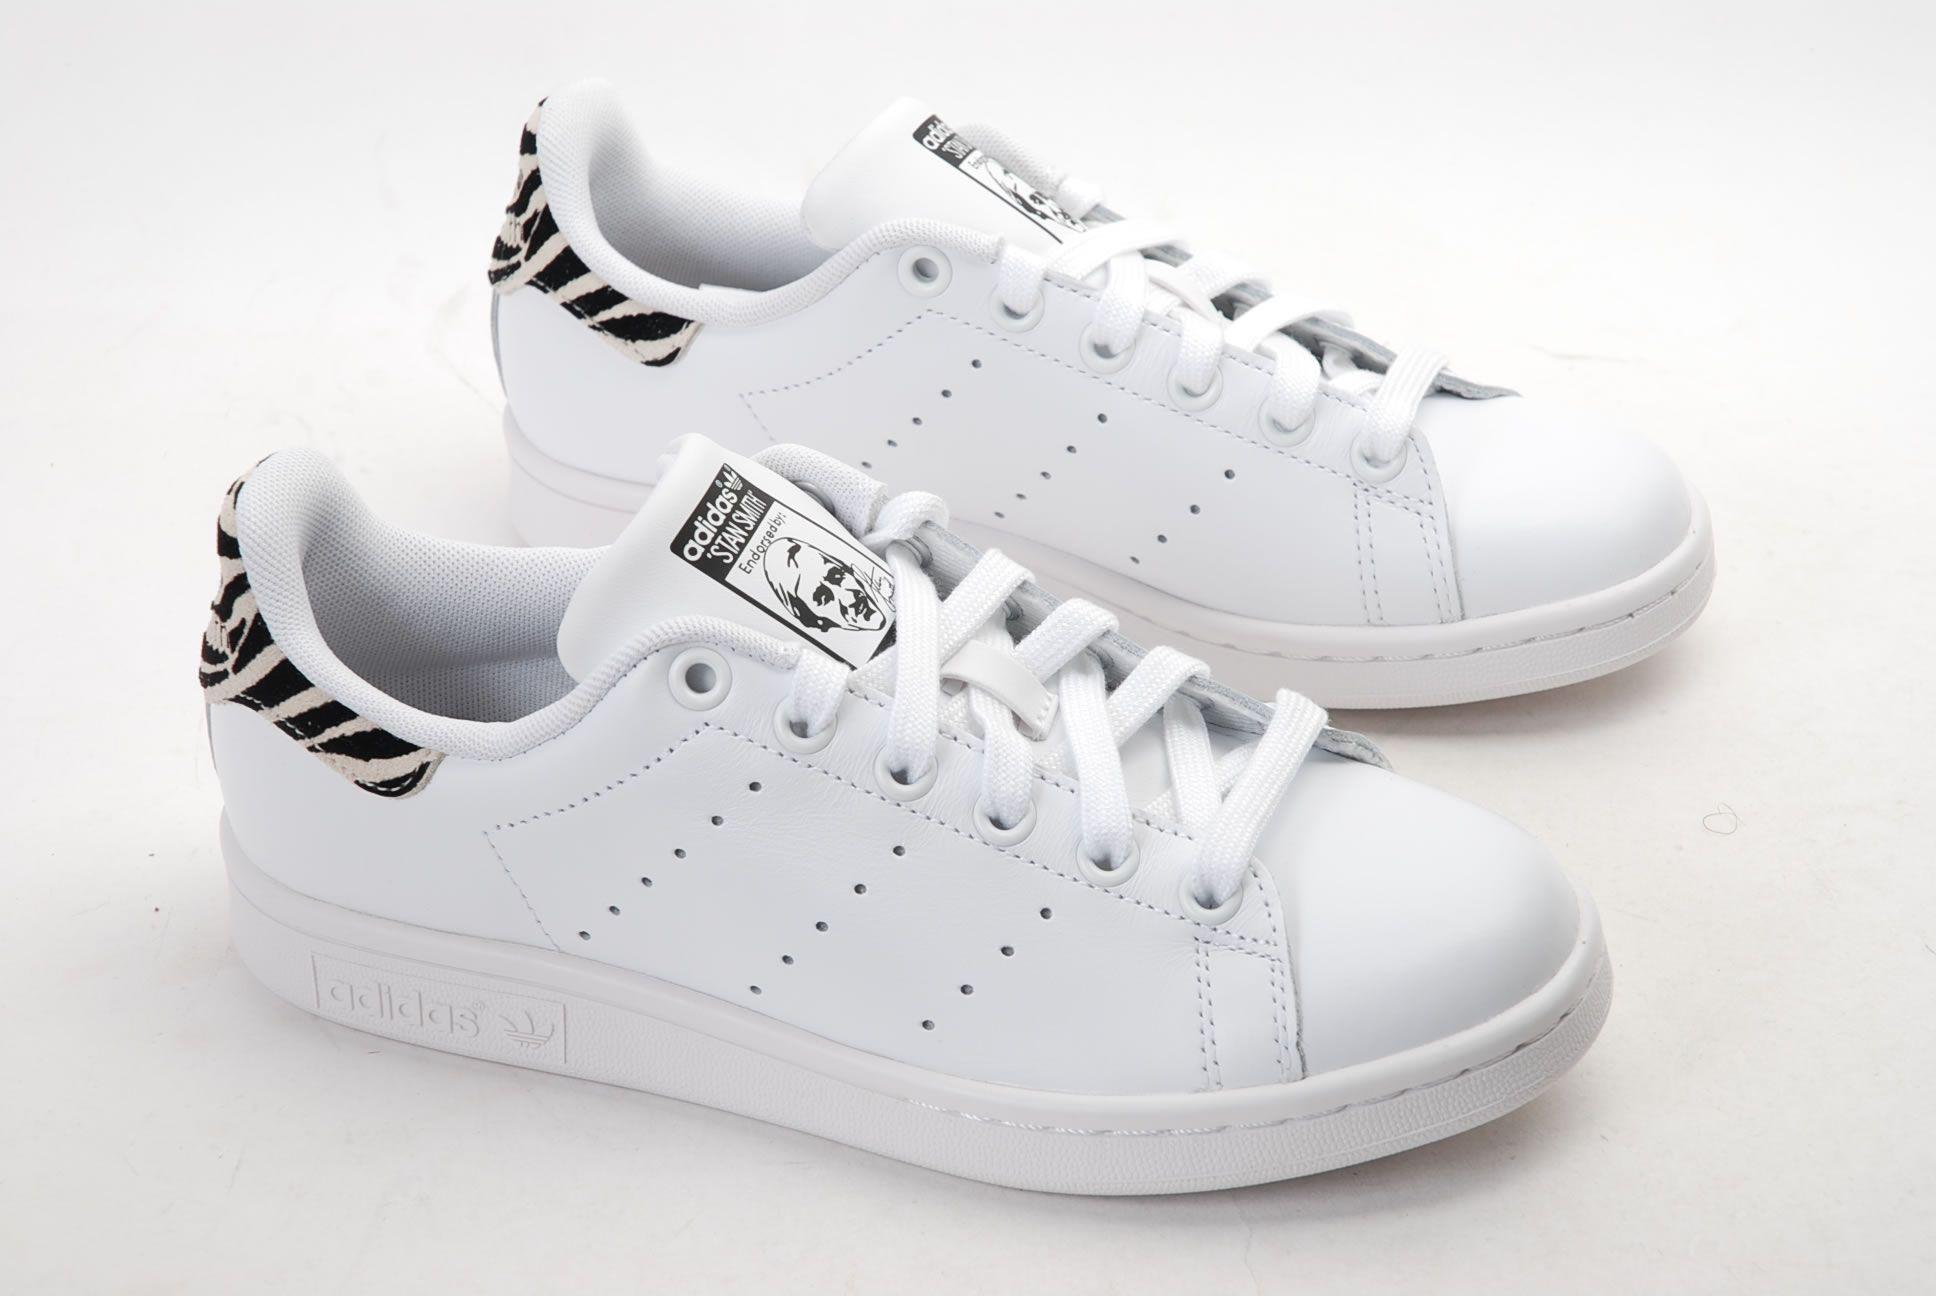 Adidas Stan Smith Blanc/Zebre   Adidas, Stan smith, Adidas stan